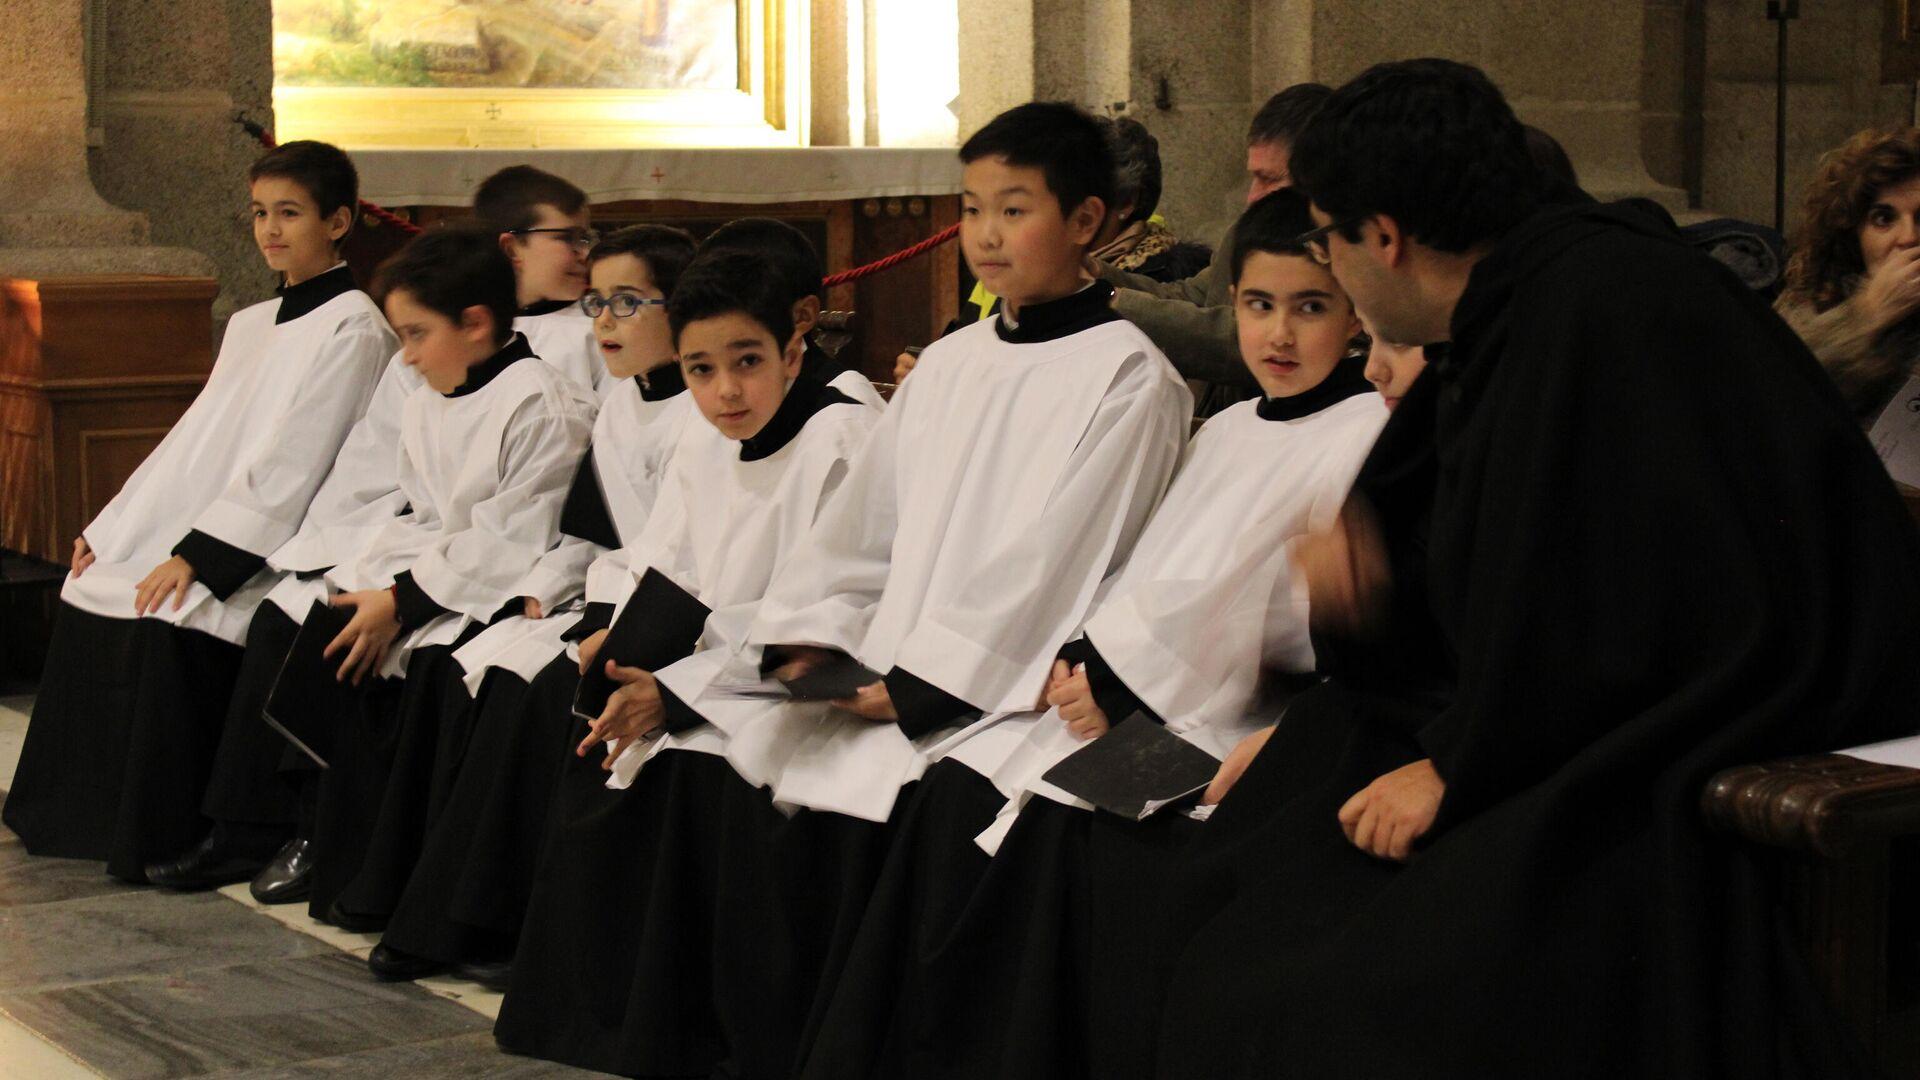 Integrantes del coro del Real Monasterio de San Lorenzo del Escorial - Sputnik Mundo, 1920, 28.05.2021